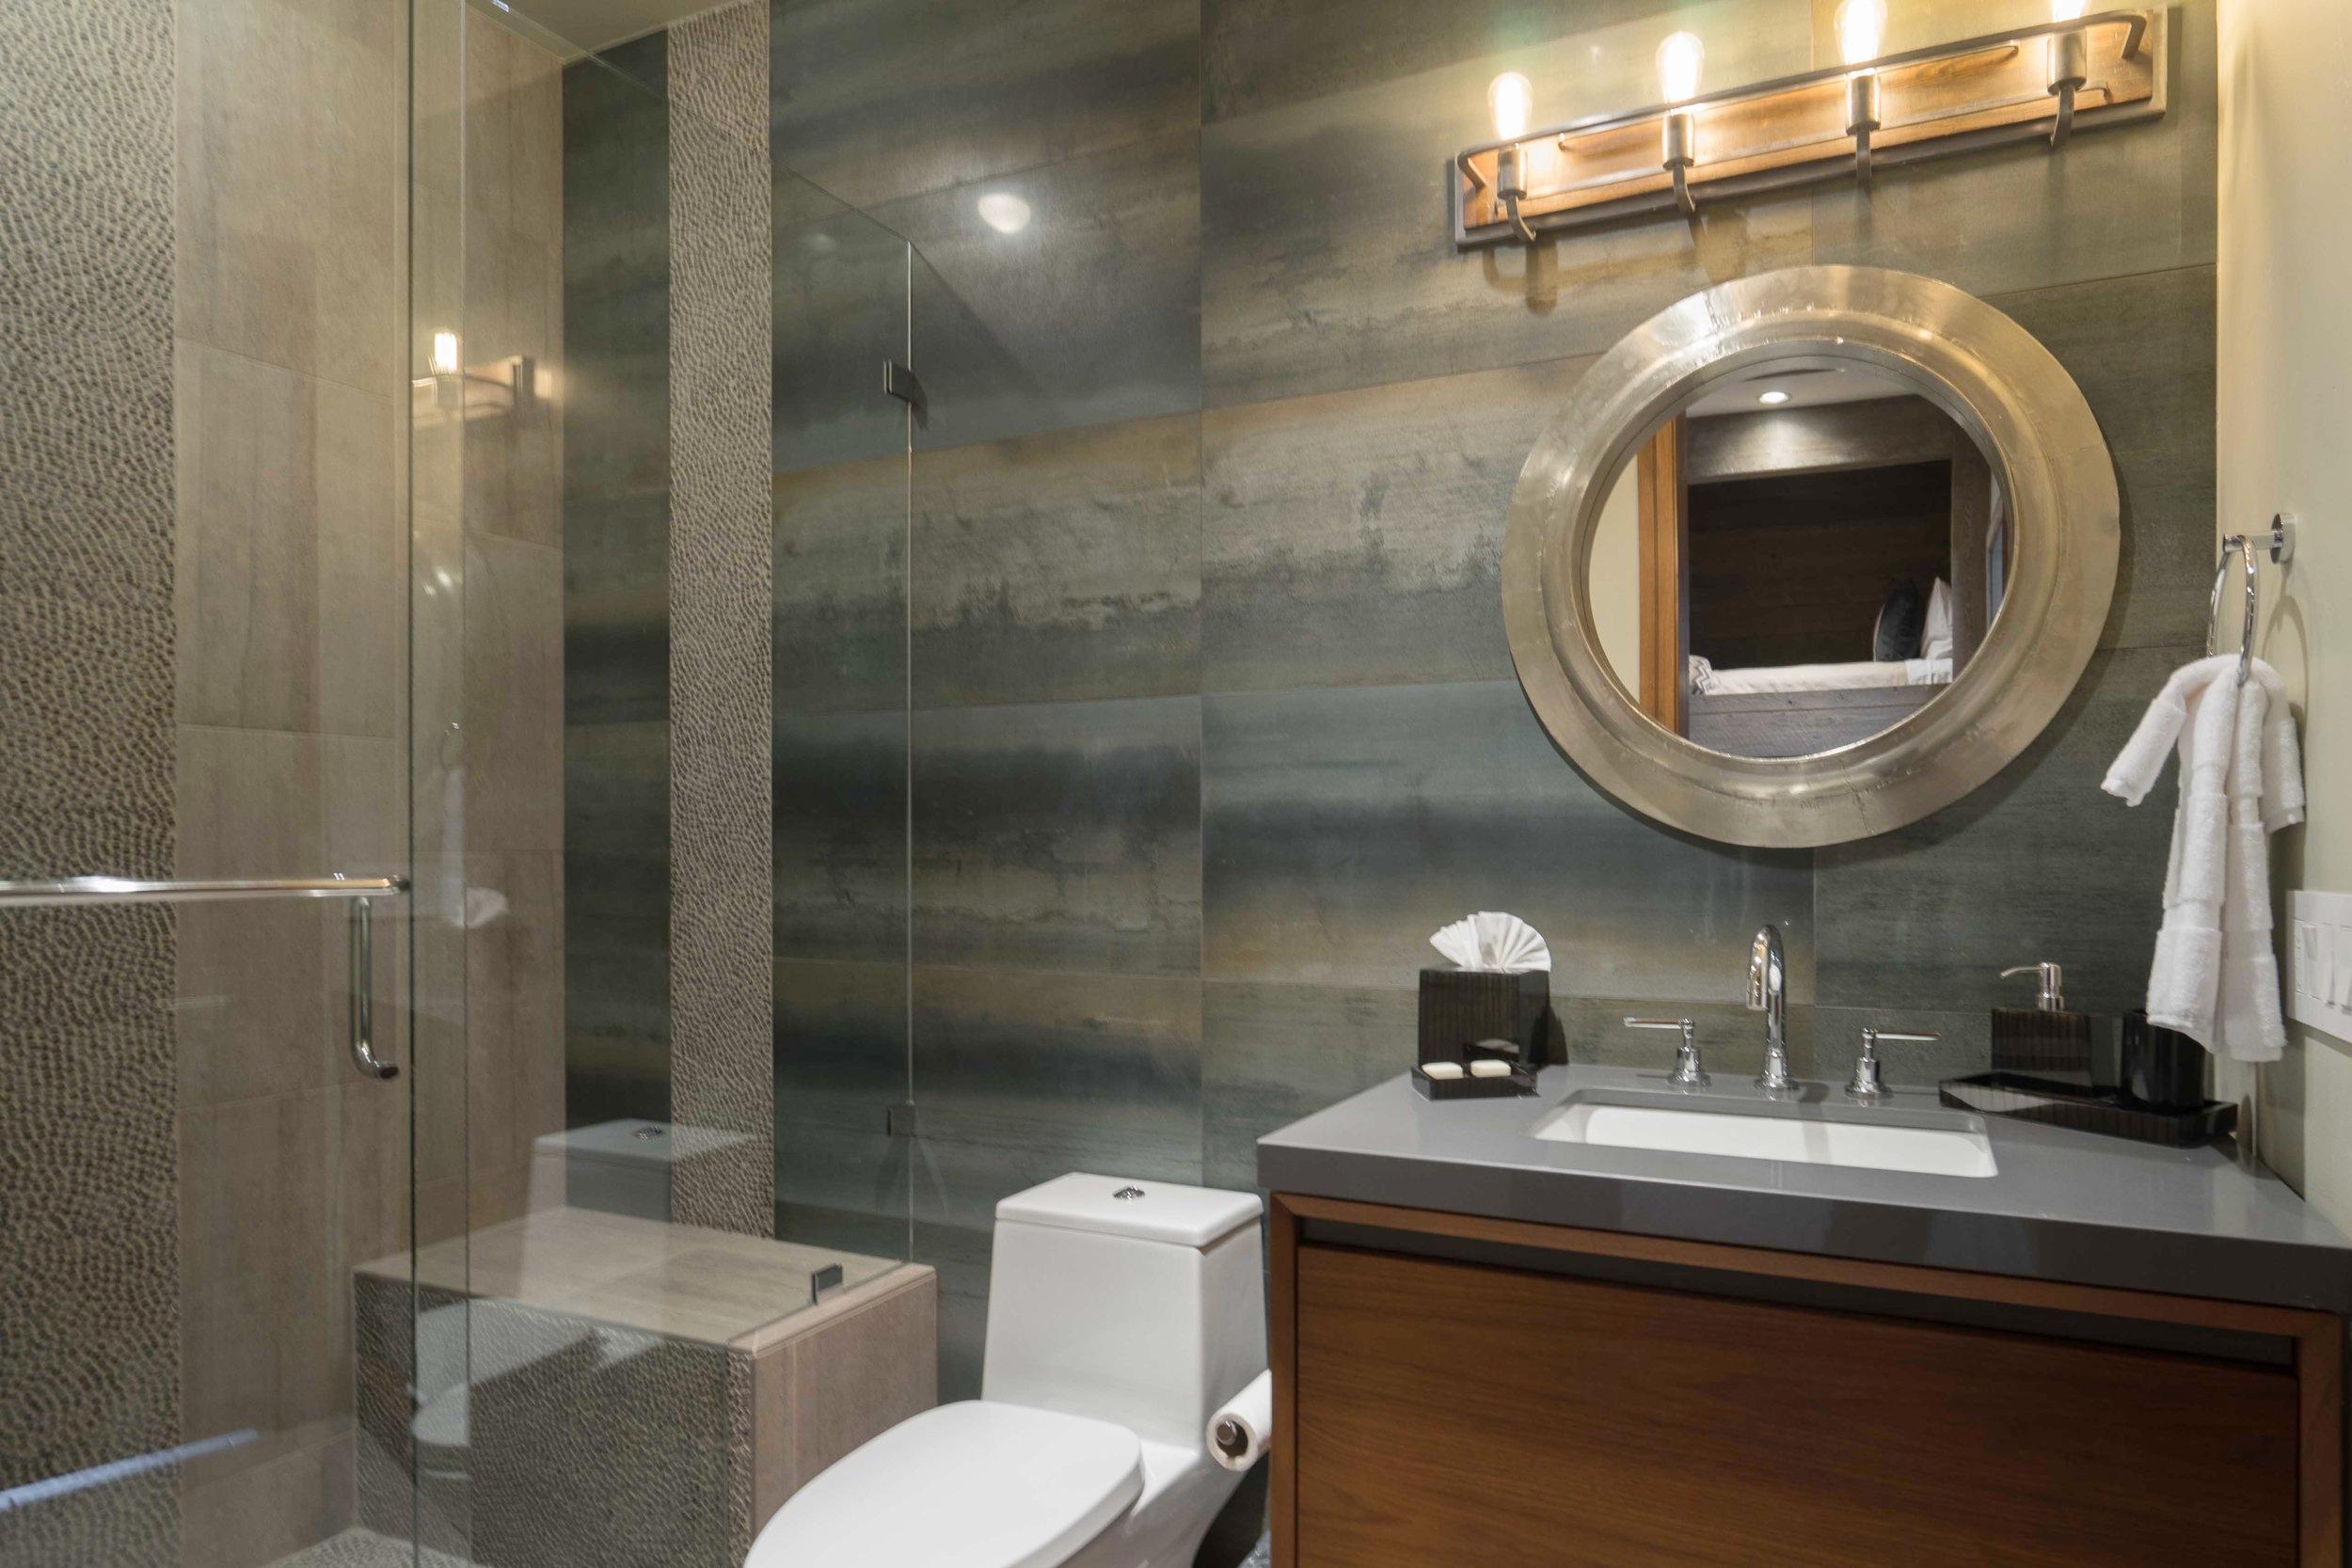 padden.bunk.bath.1.jpg